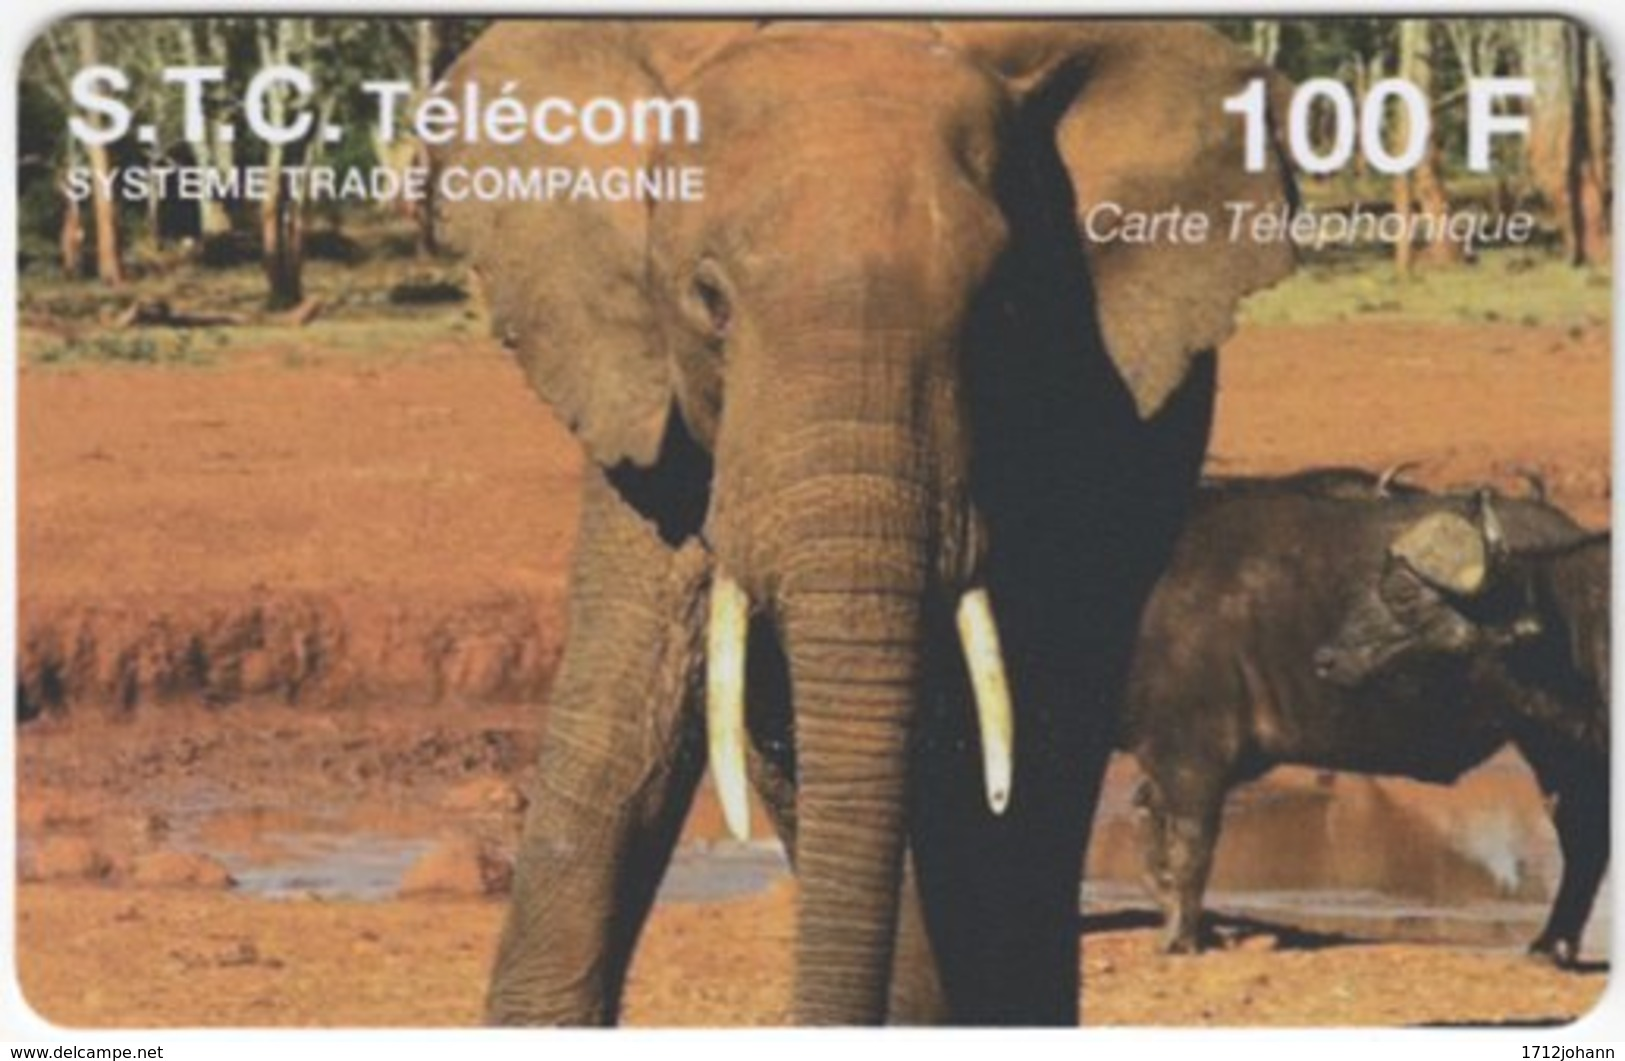 FRANCE C-549 Prepaid STC - Animal, Elephant - Used - Nachladekarten (Refill)